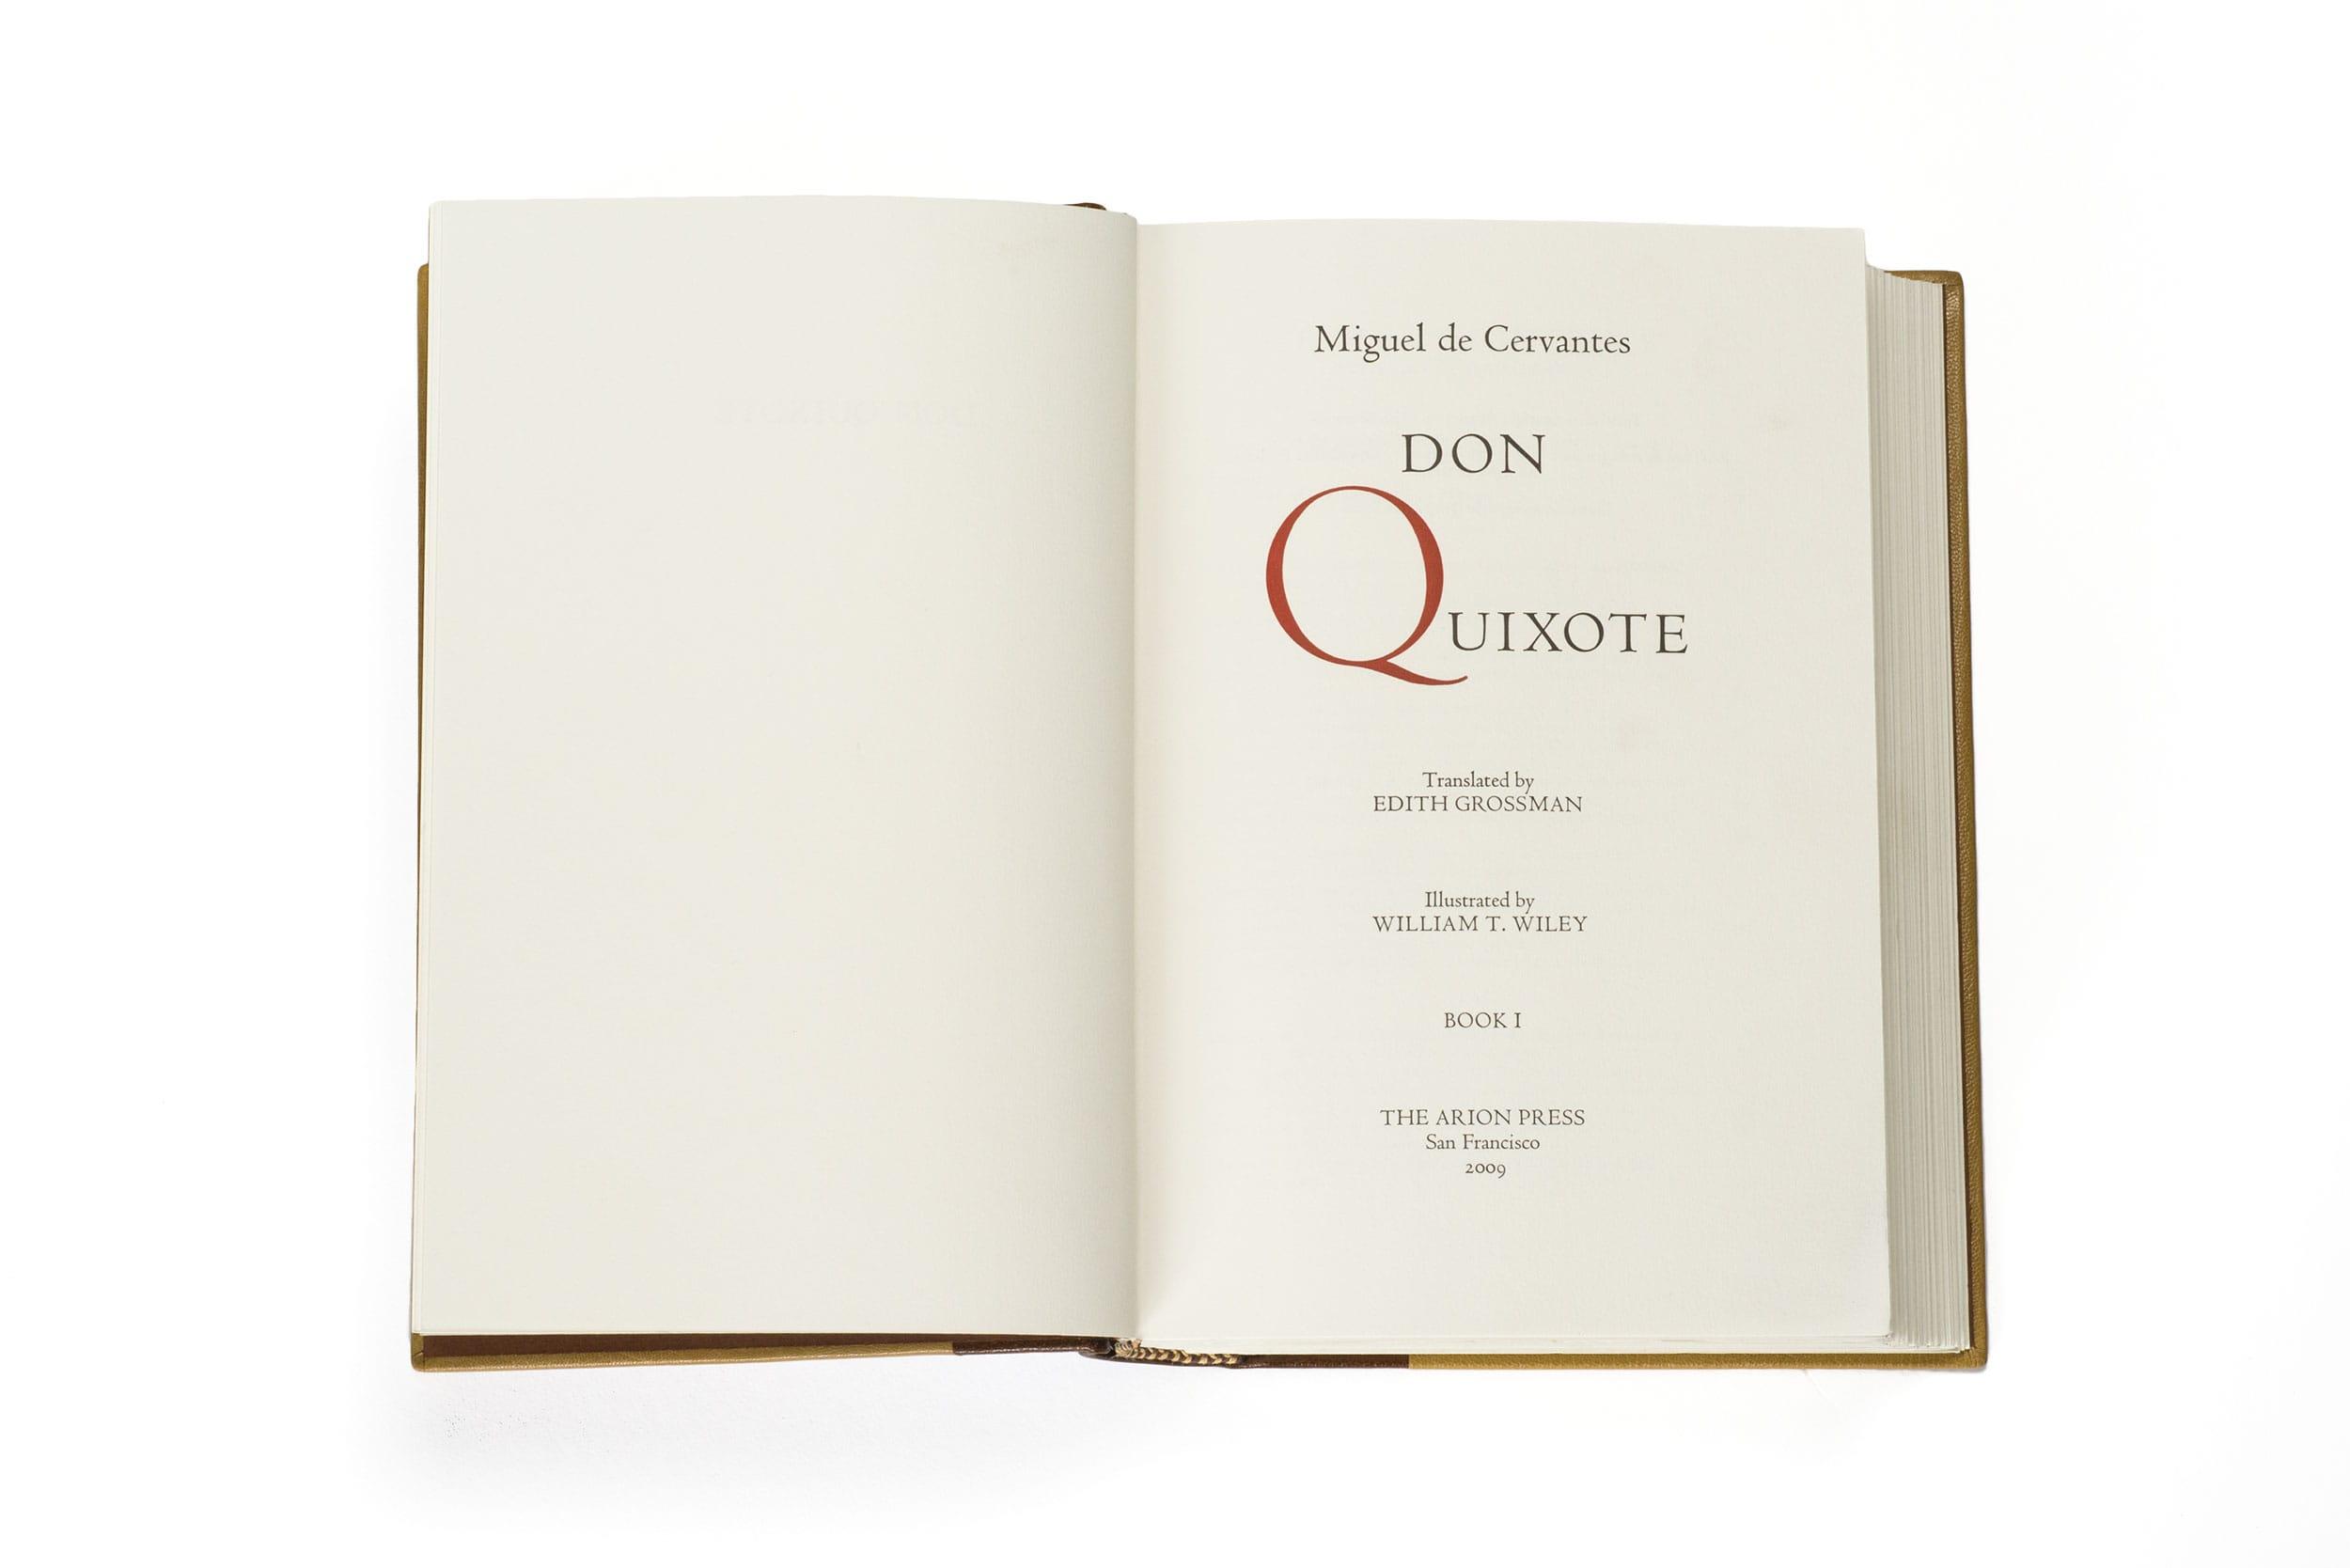 086_Don_Quixote.I.Title.jpg